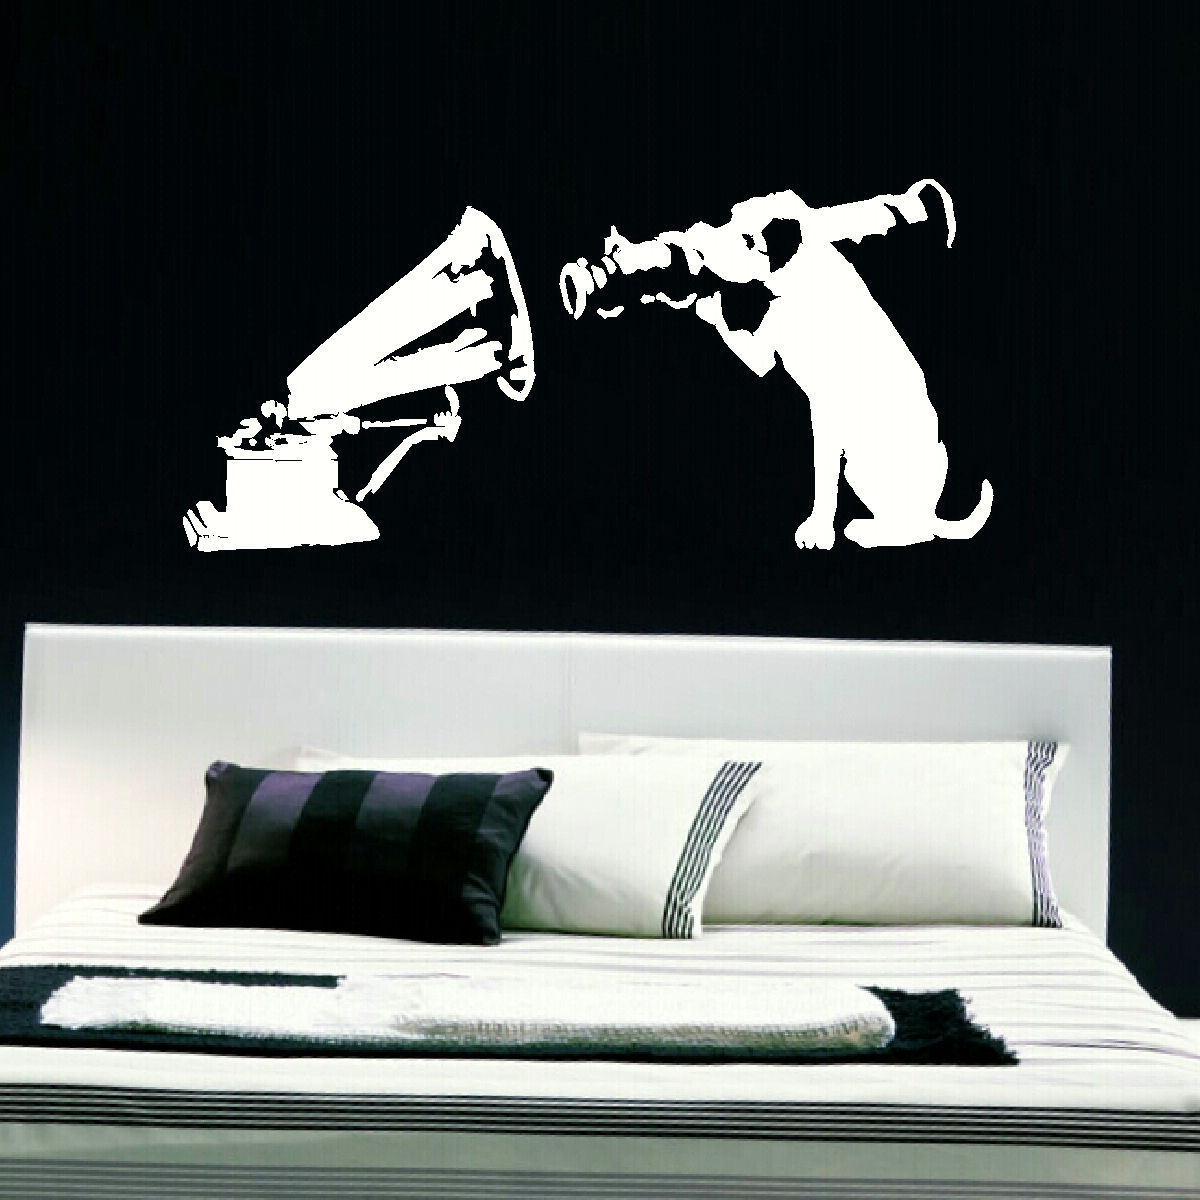 LARGE BANKSY PANDA ART BEDROOM WALL MURAL STENCIL STICKER TRANSFER VINYL DECAL